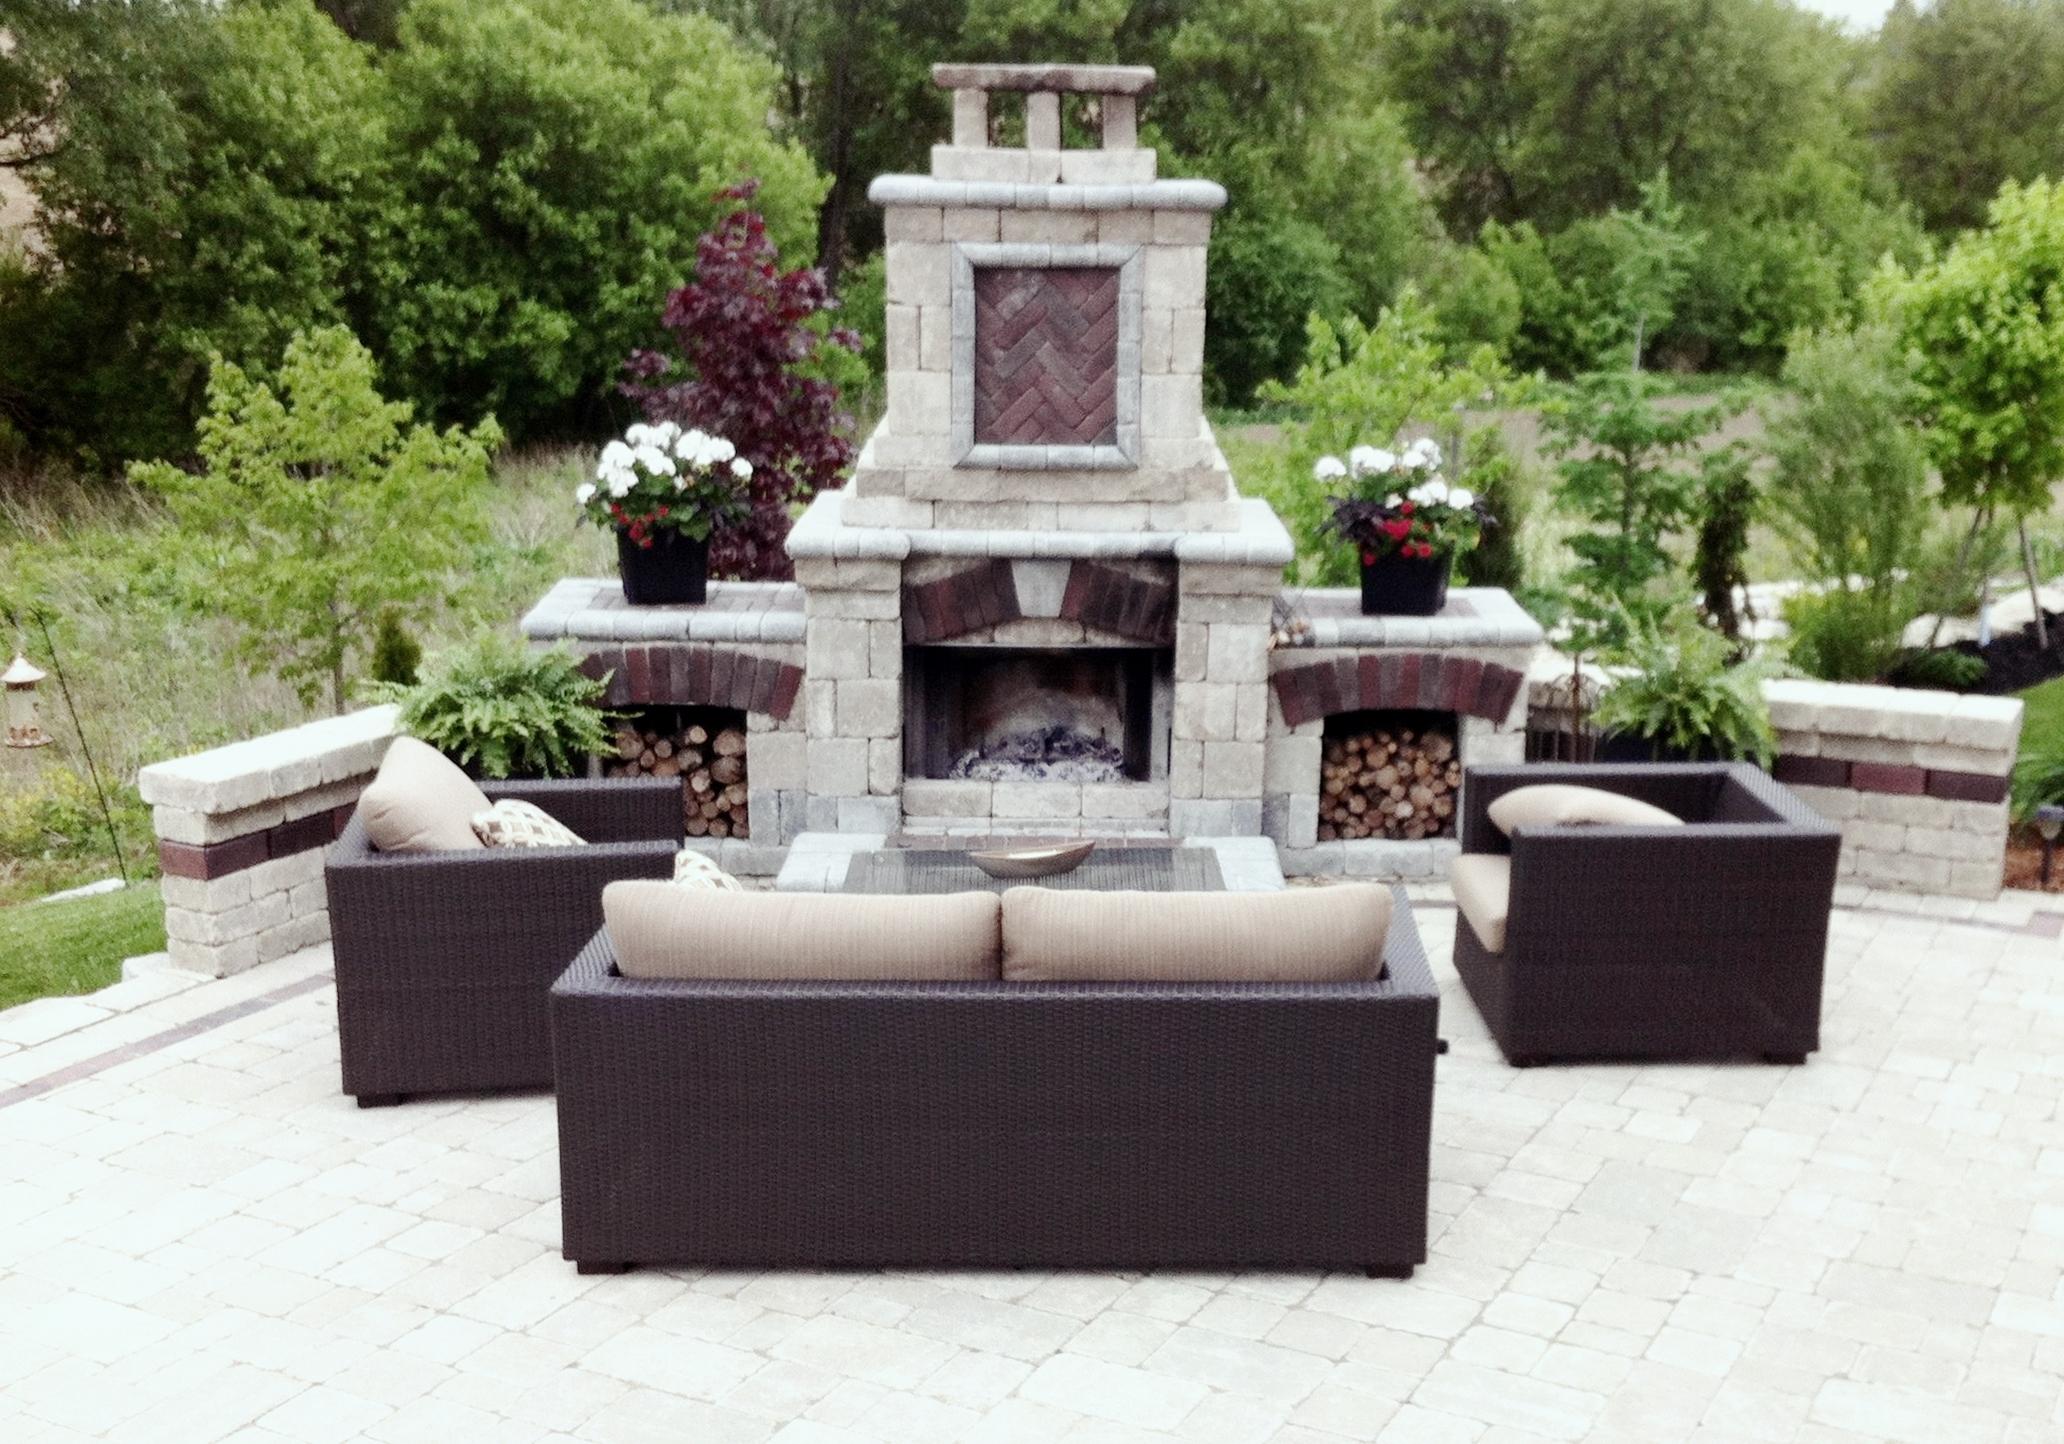 london-ontario-driveway-stone-firelpace-patio-landscaper-06.jpg